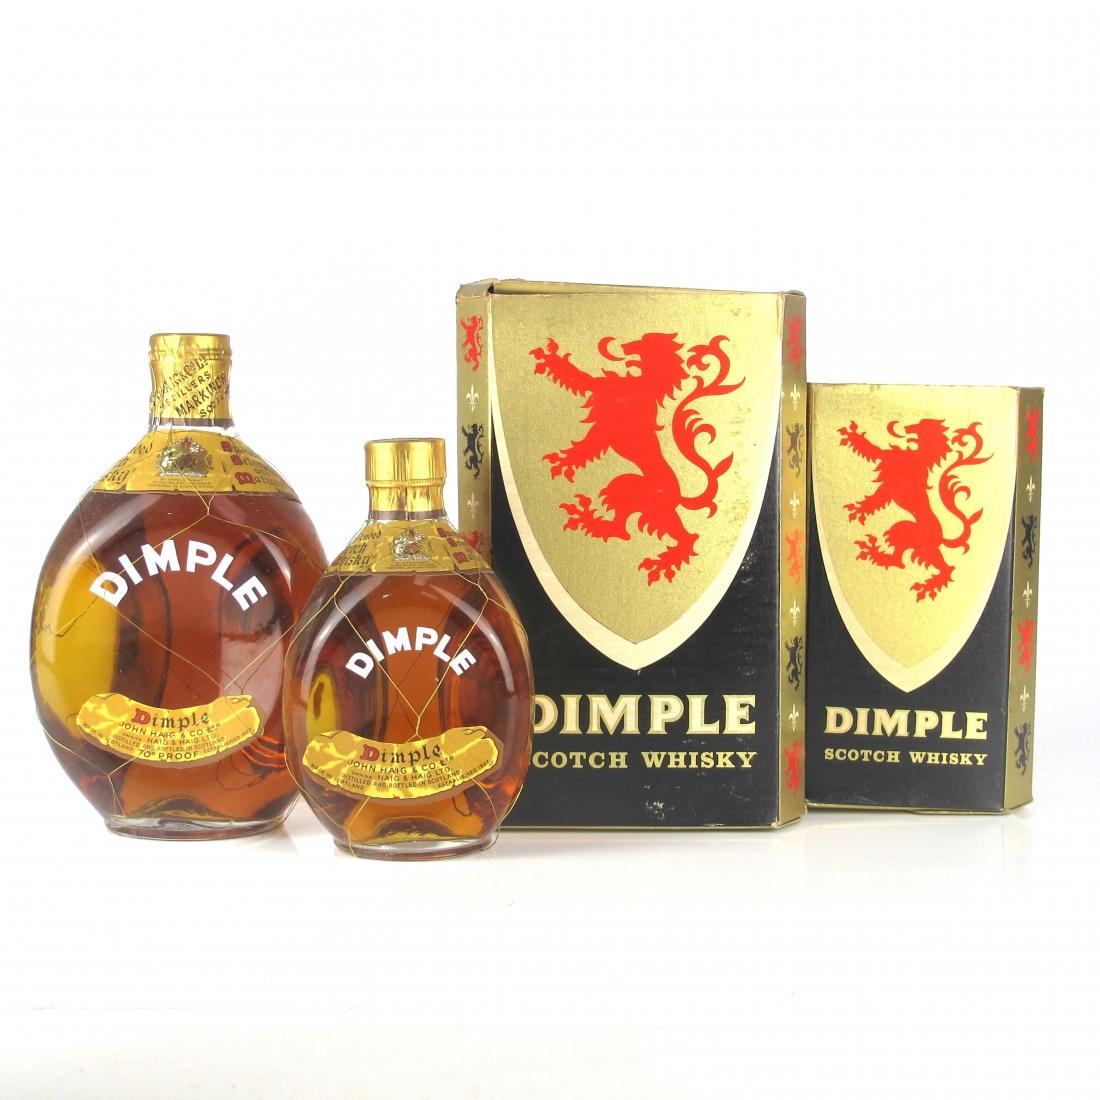 Haig's Dimple 1960s / Including Half Bottle